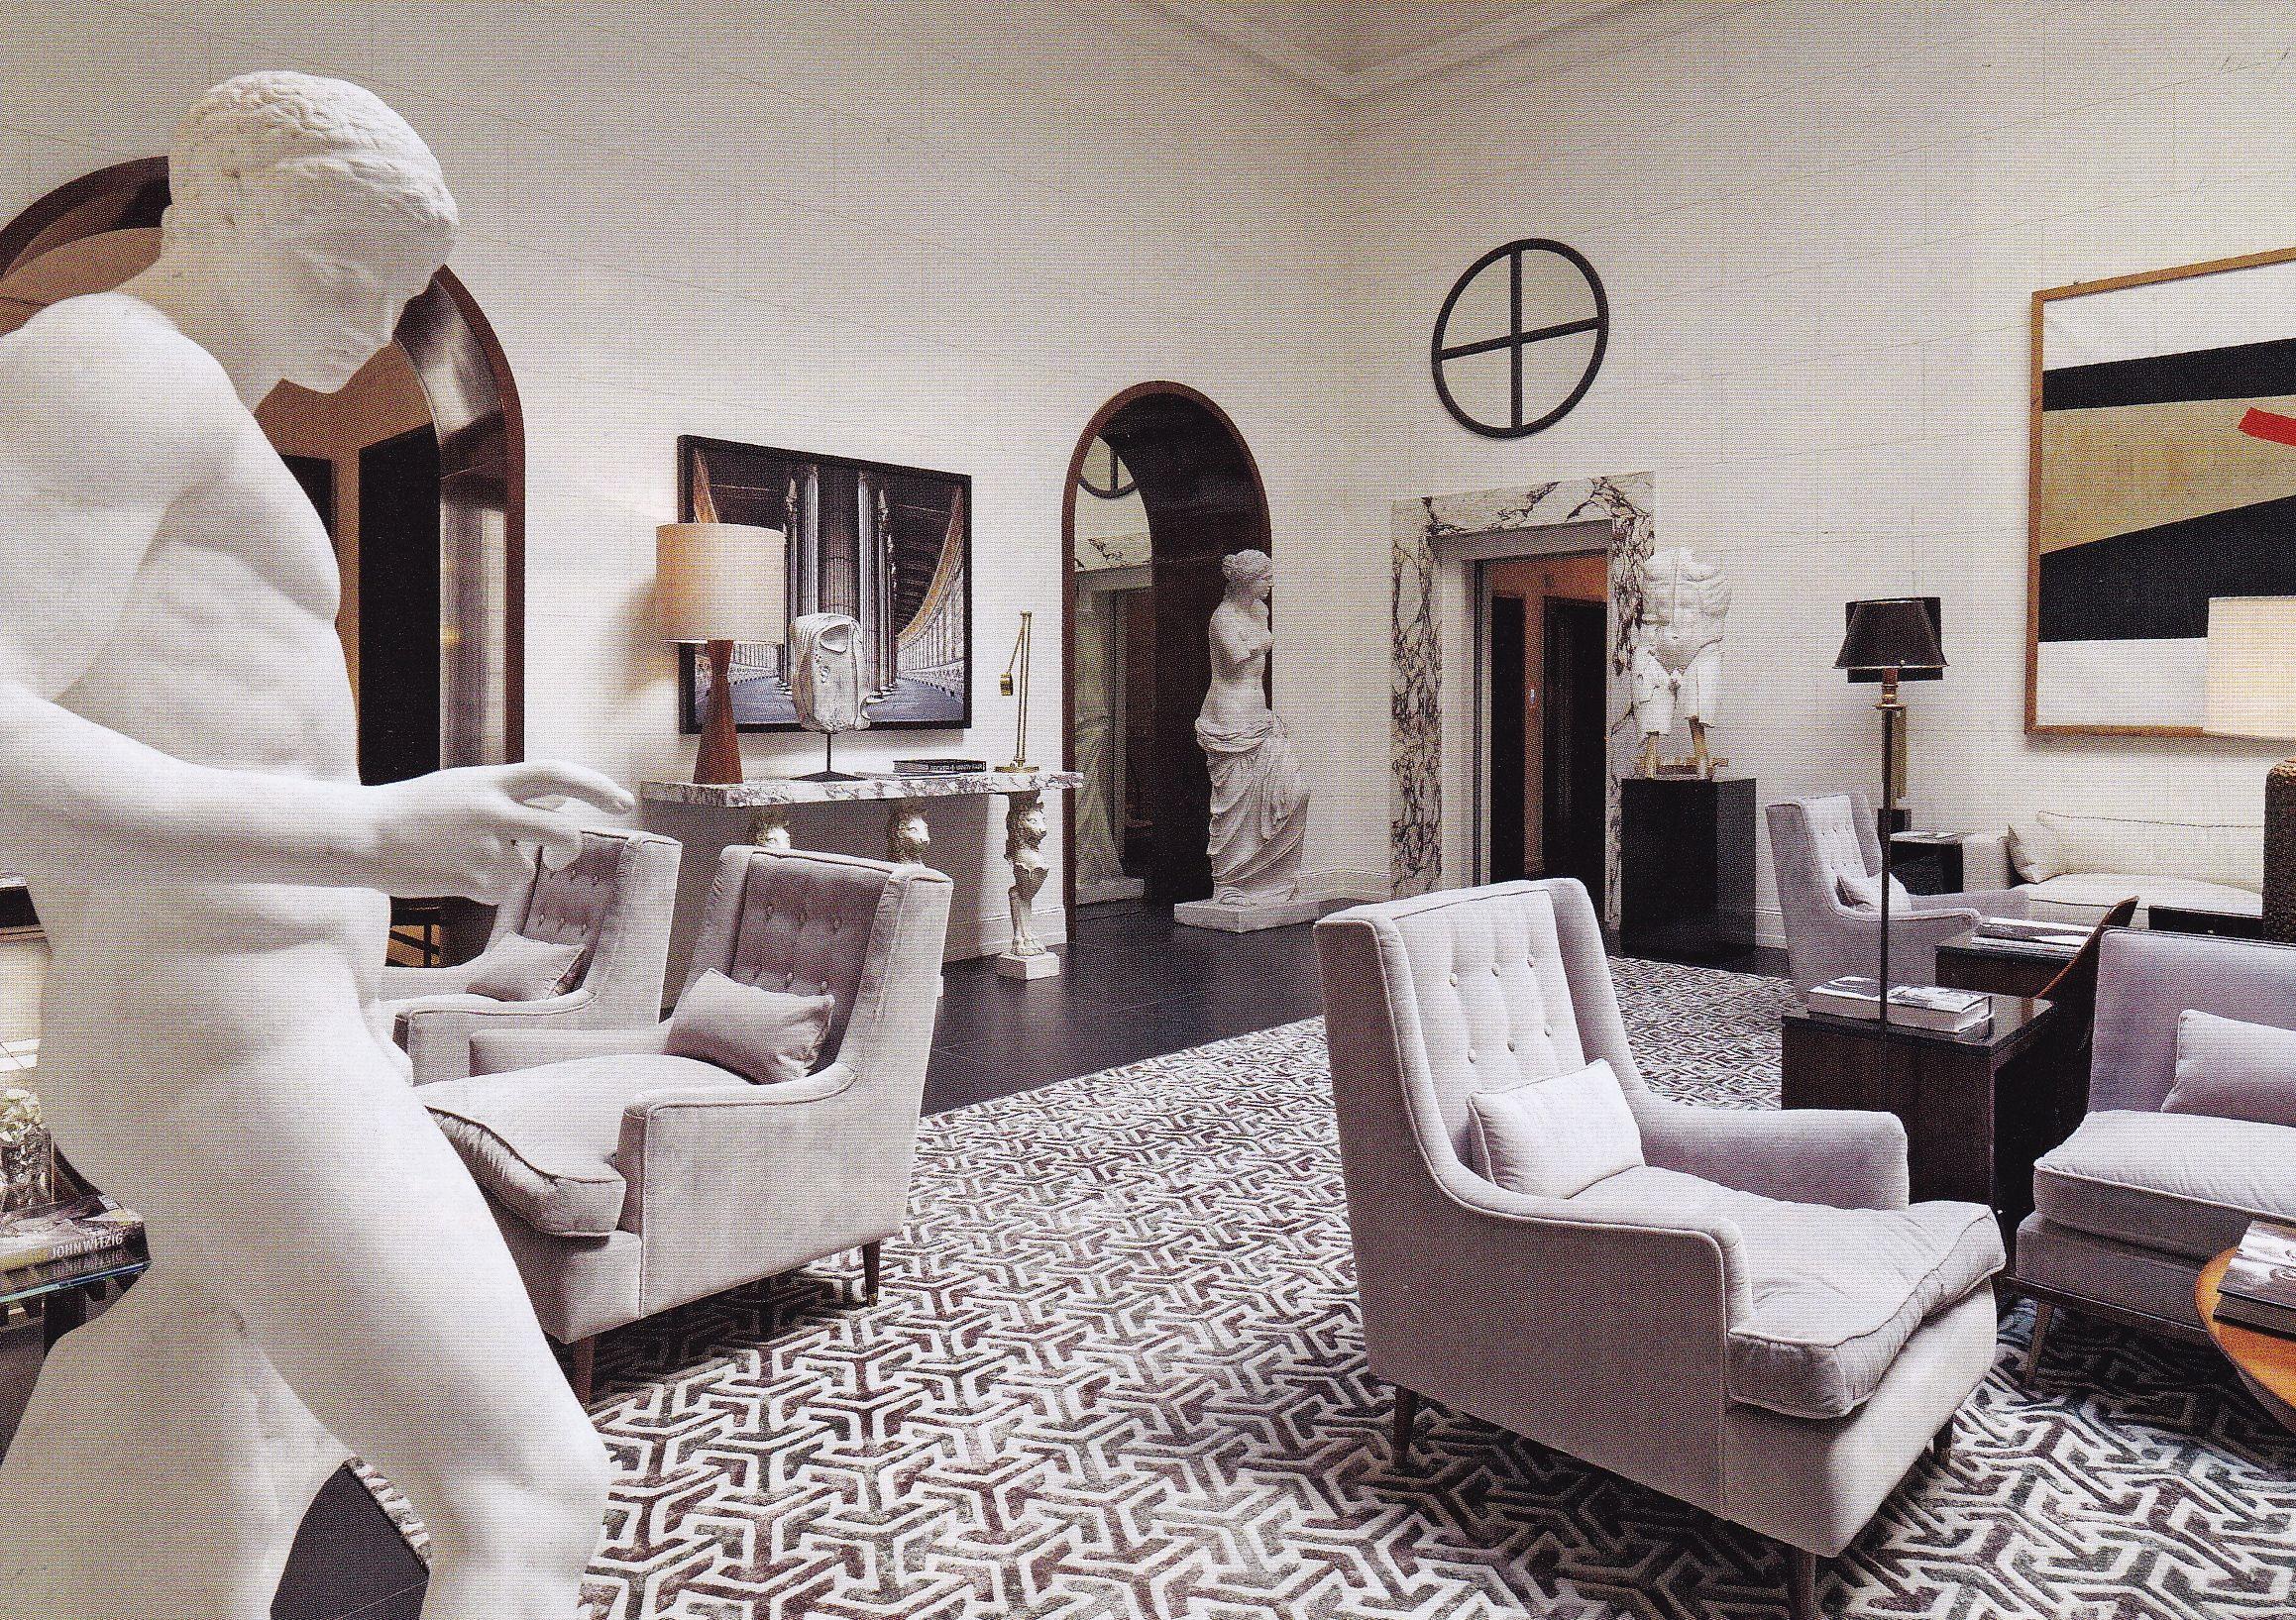 j.k. place roma hotel-michele bonan-ad italia-february 2014